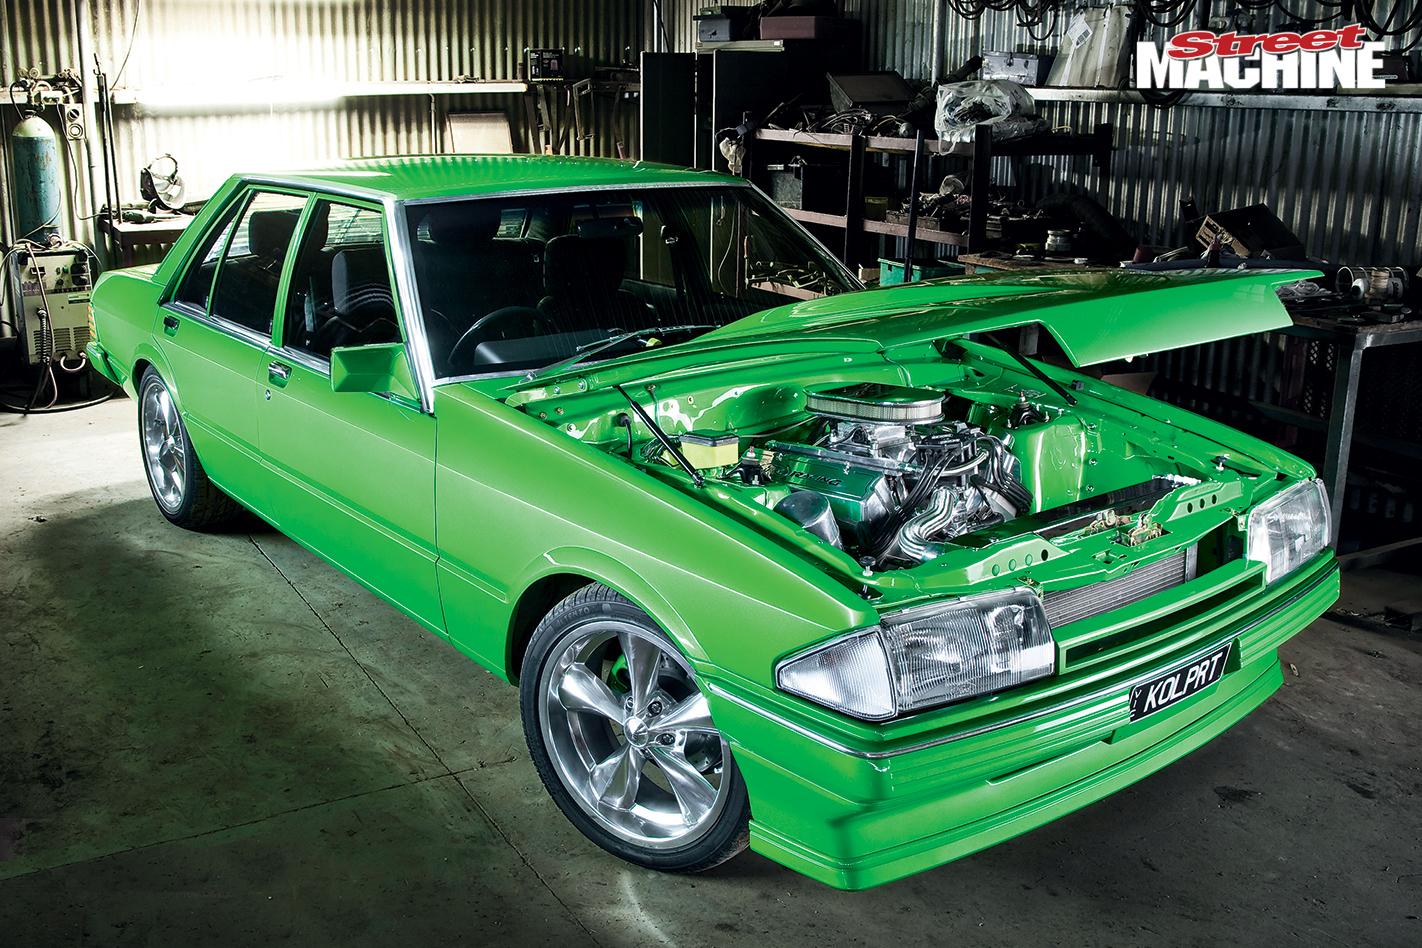 Ford -xe -falcon -2-2